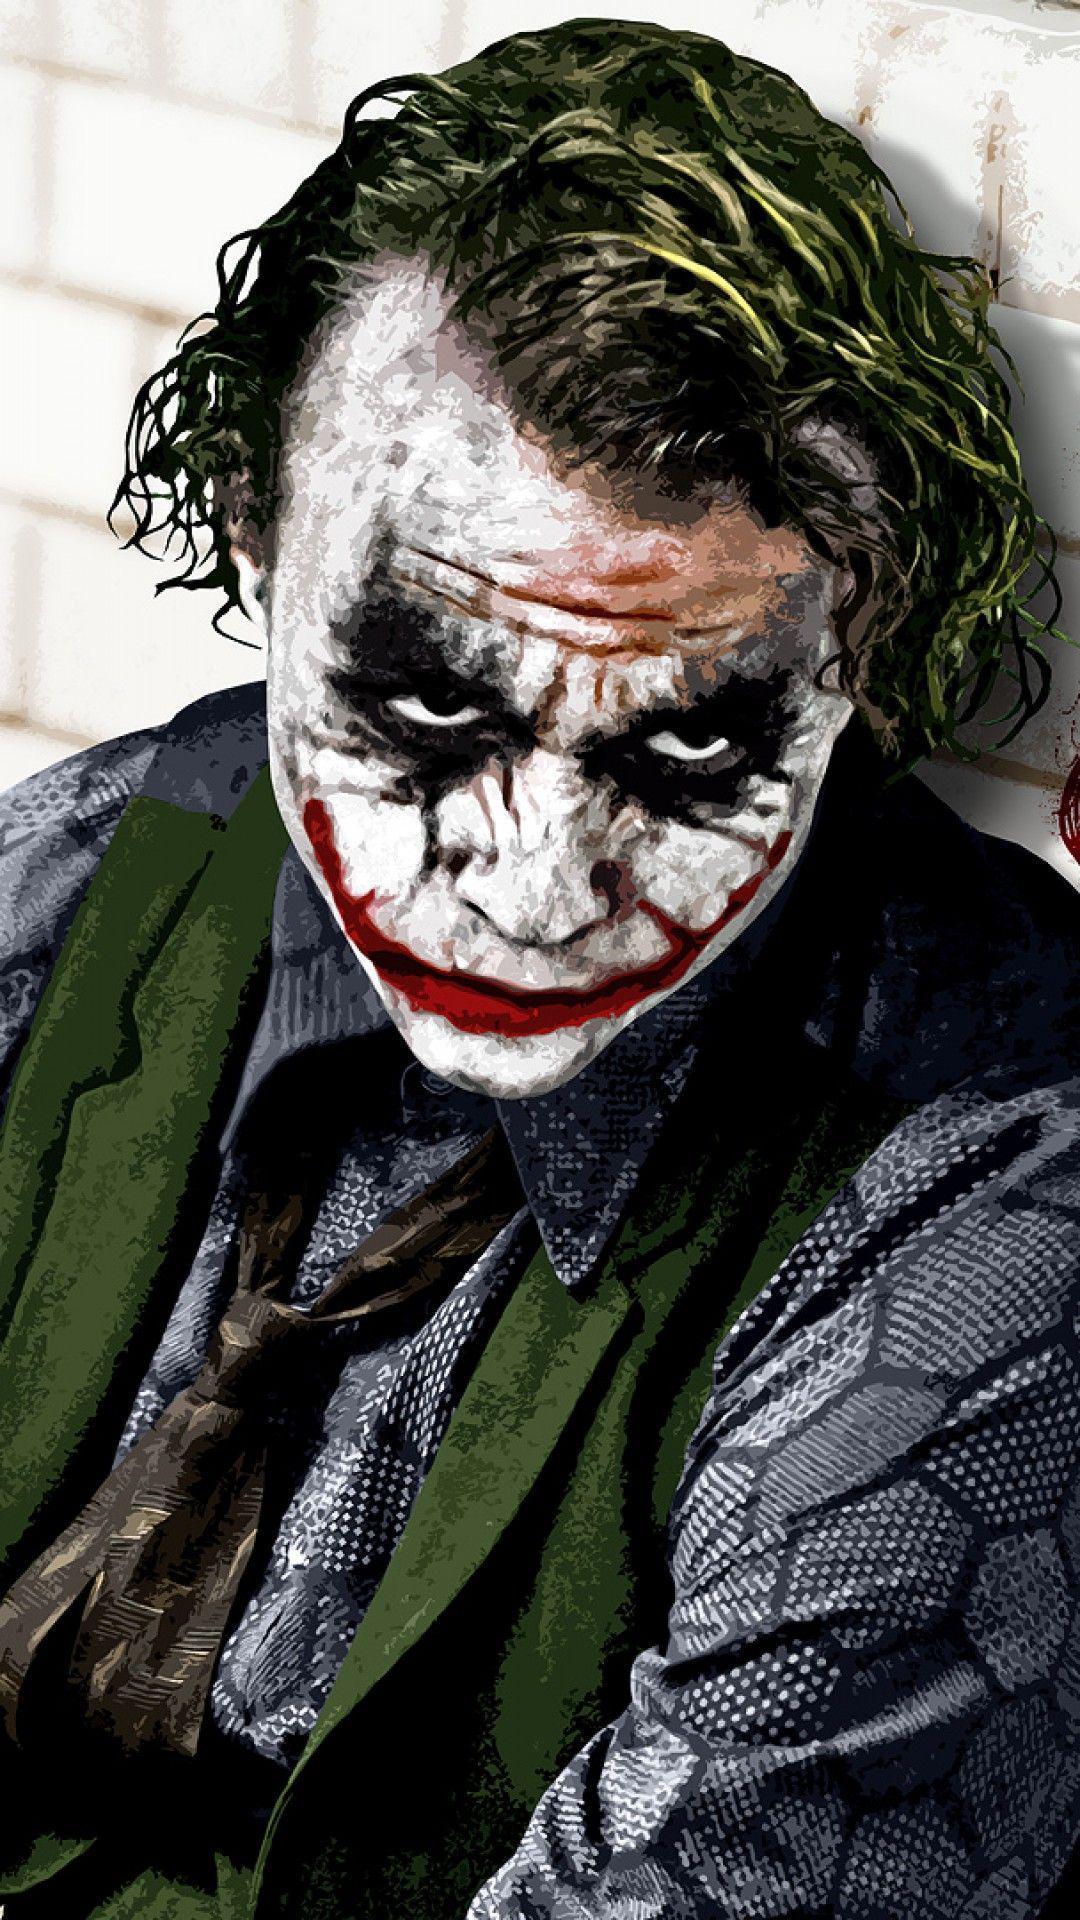 Joker HD wallpapers for iphone14